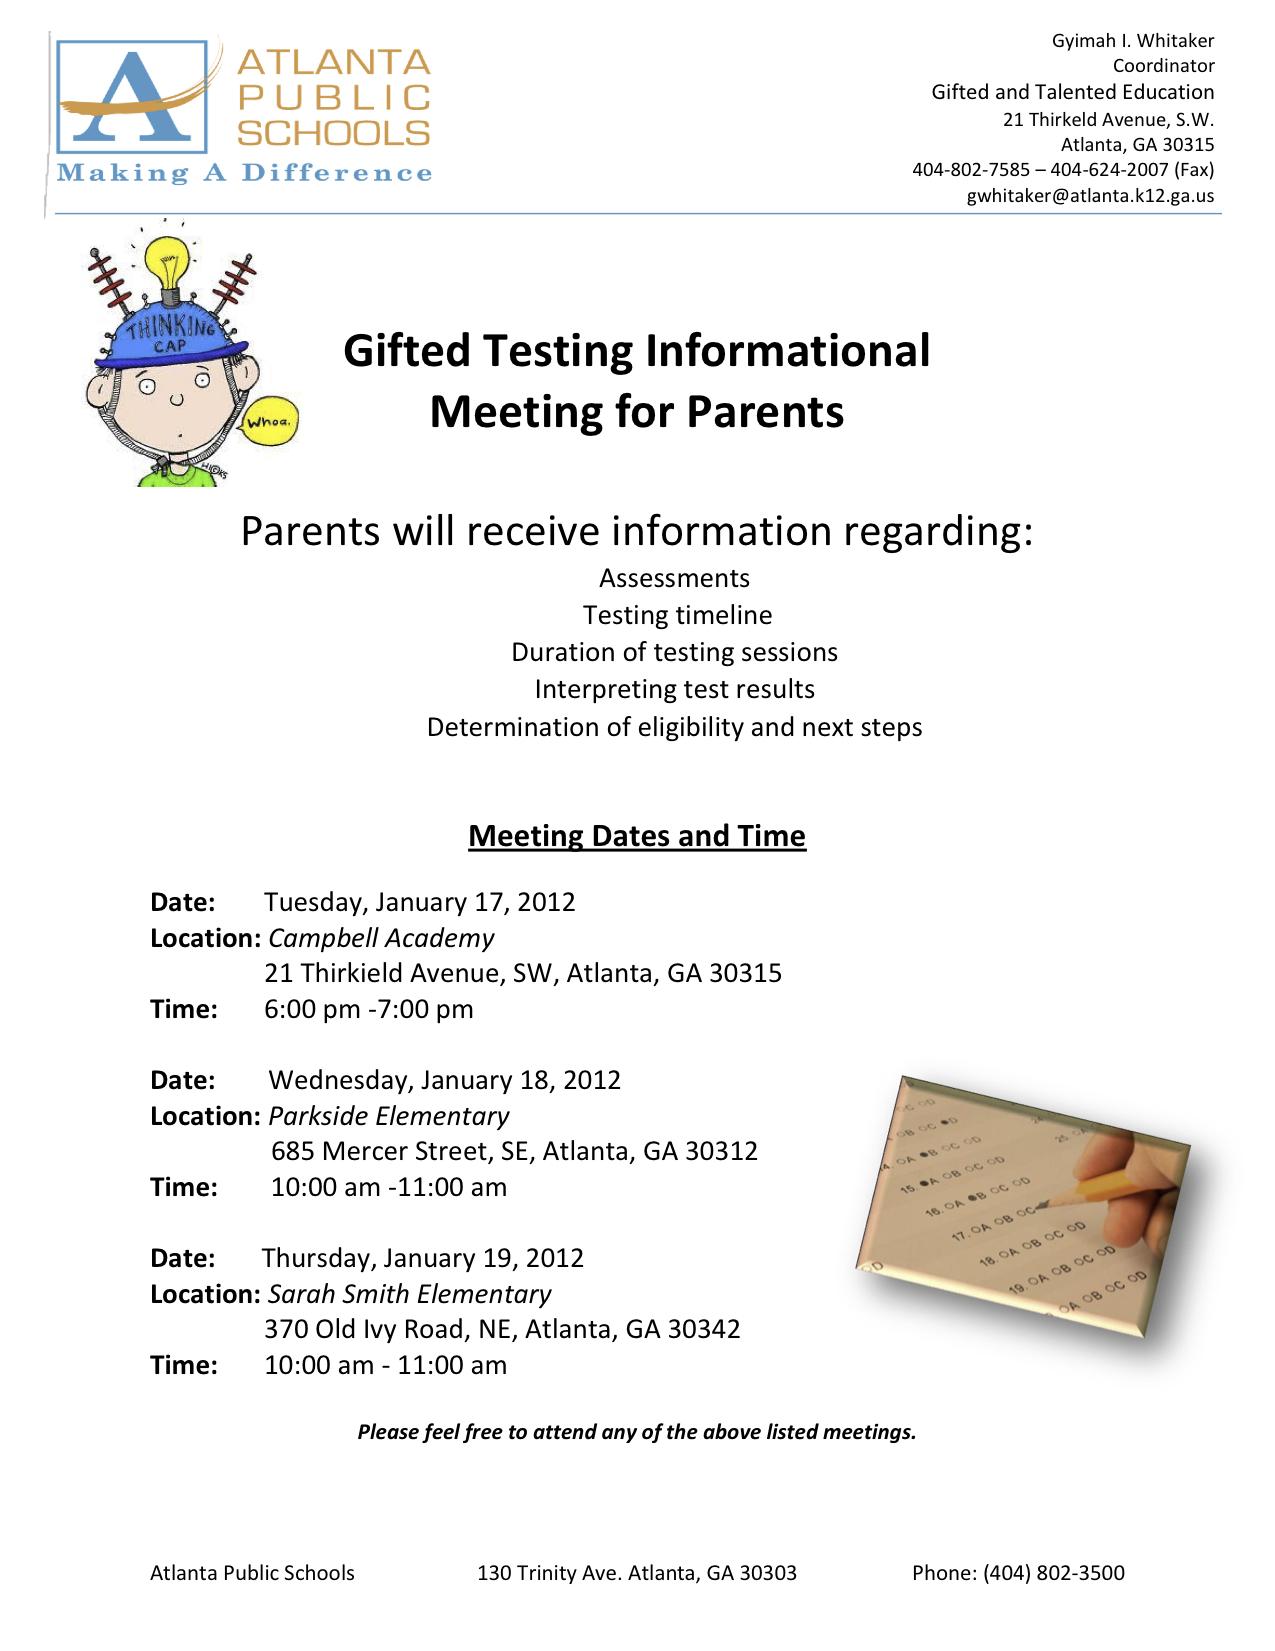 Sample Letter For Gifted Testing